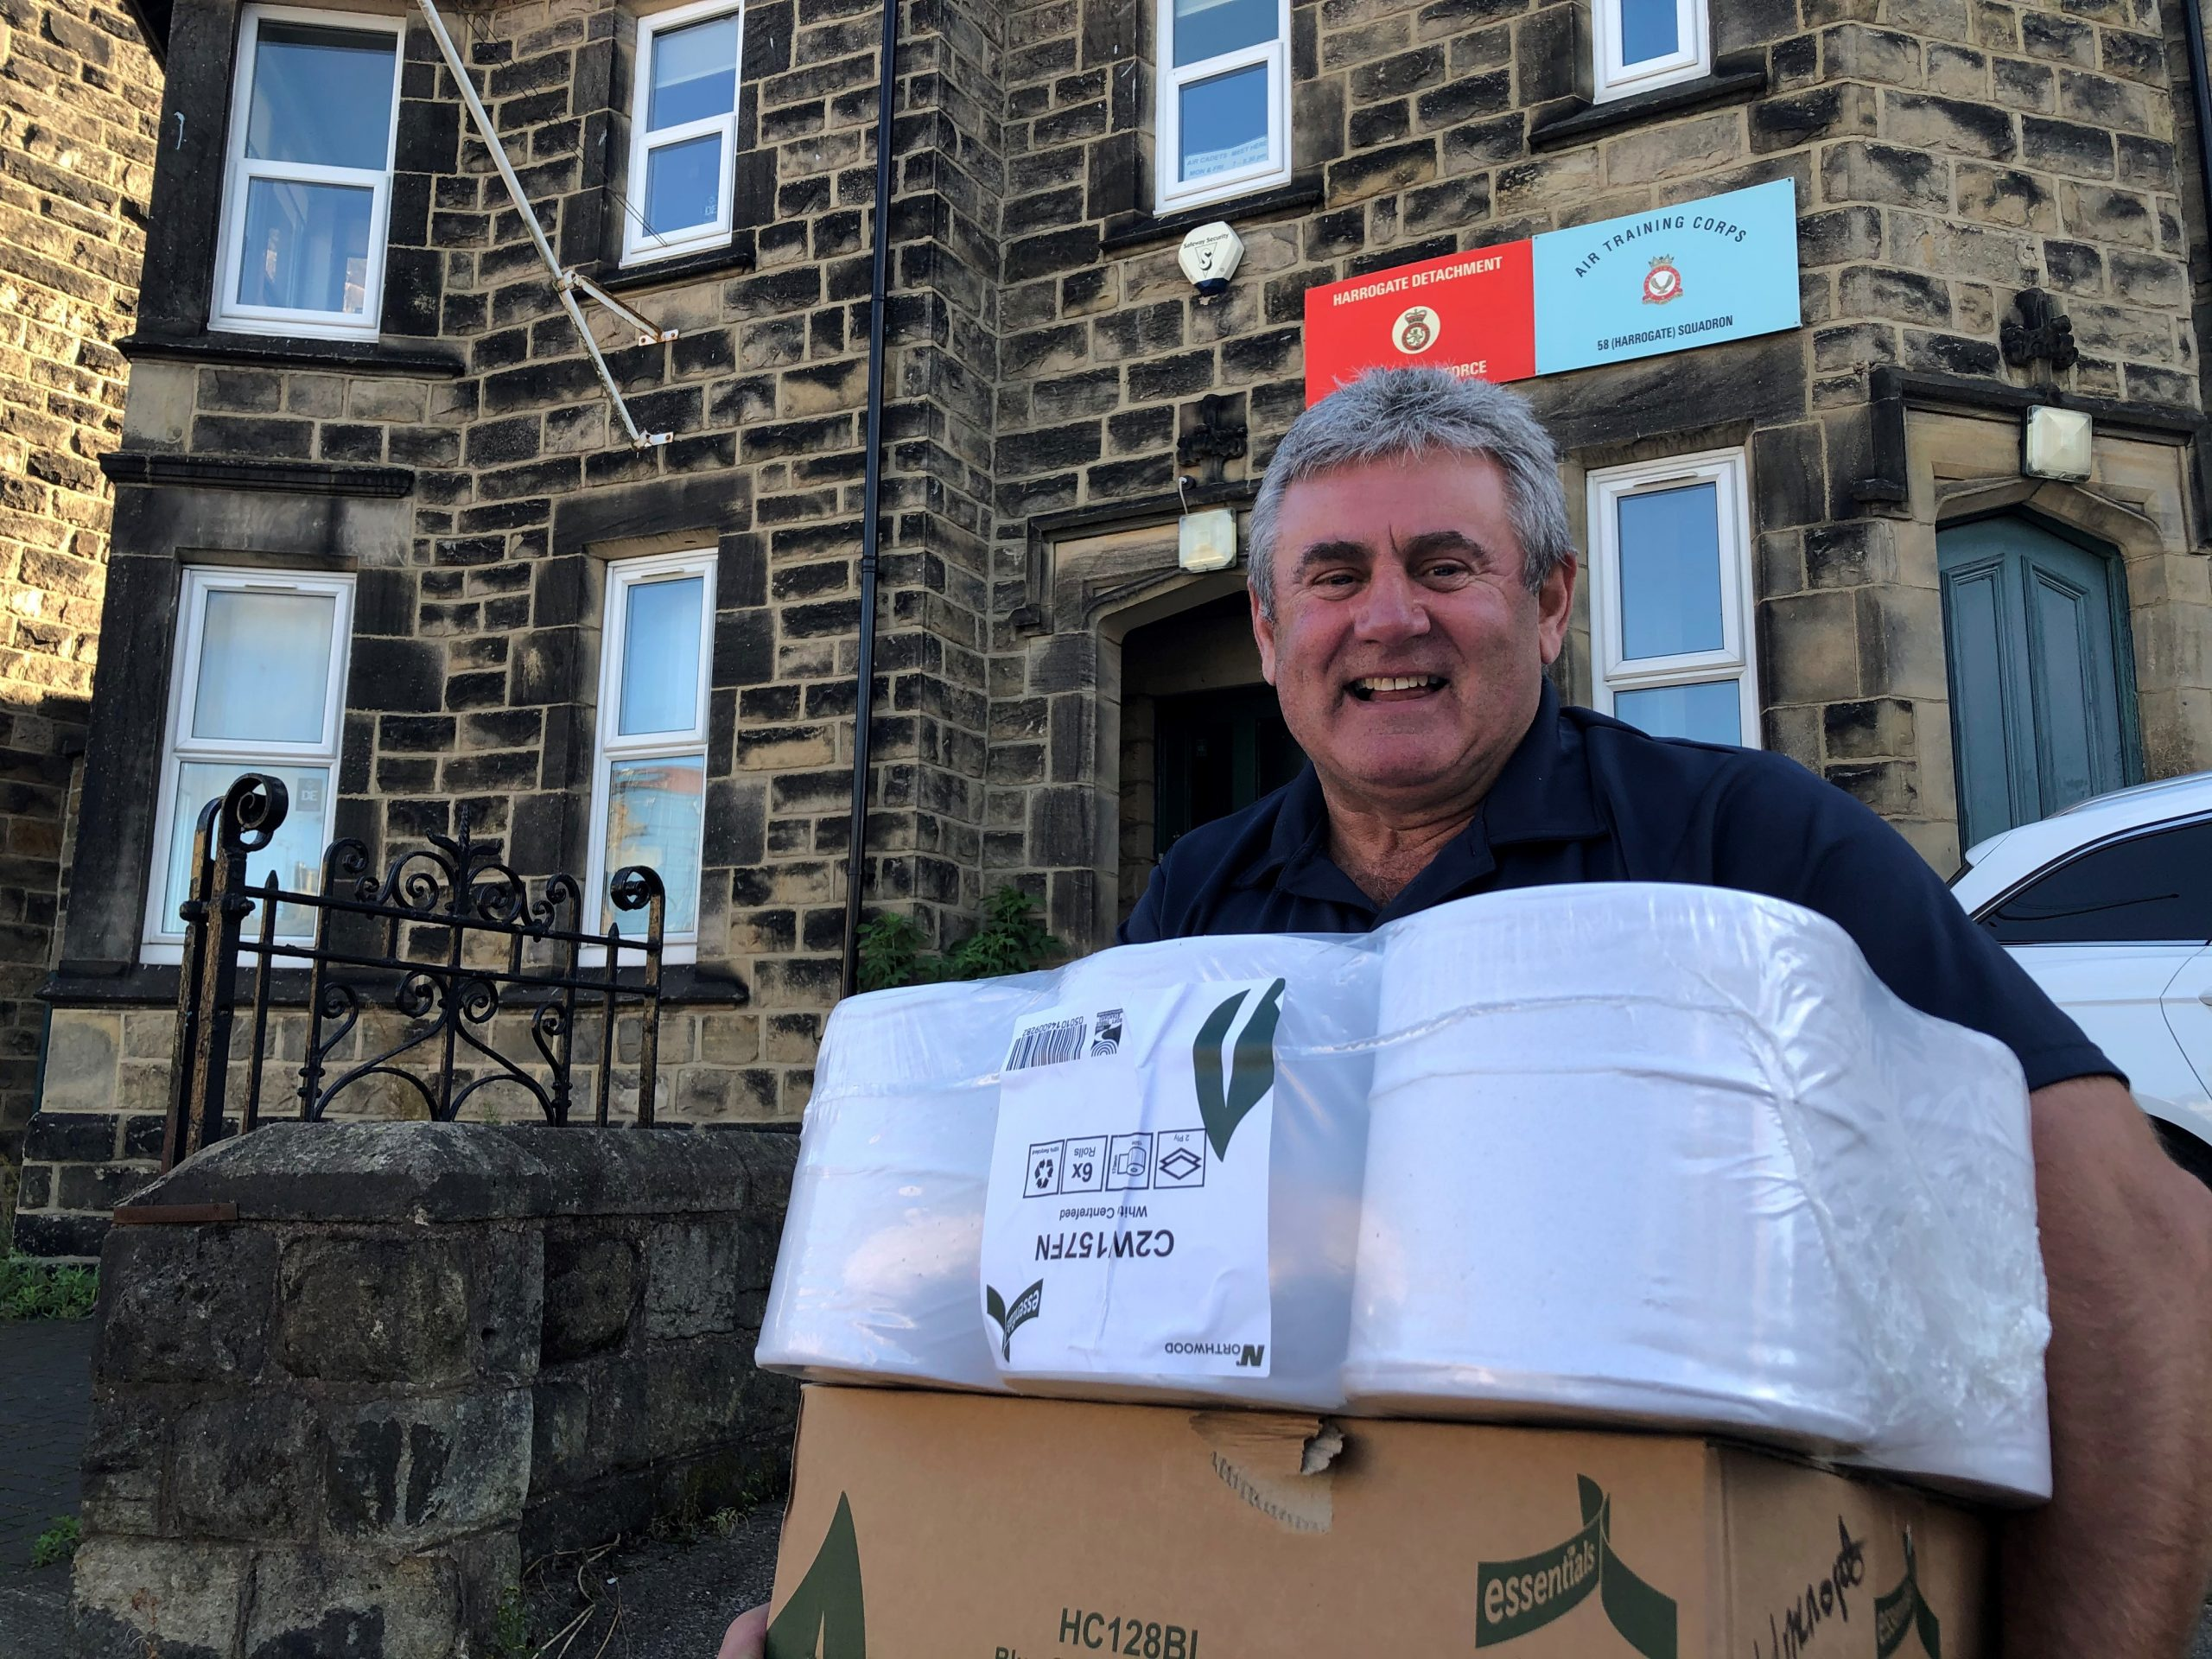 Mal Clark delivering supplies